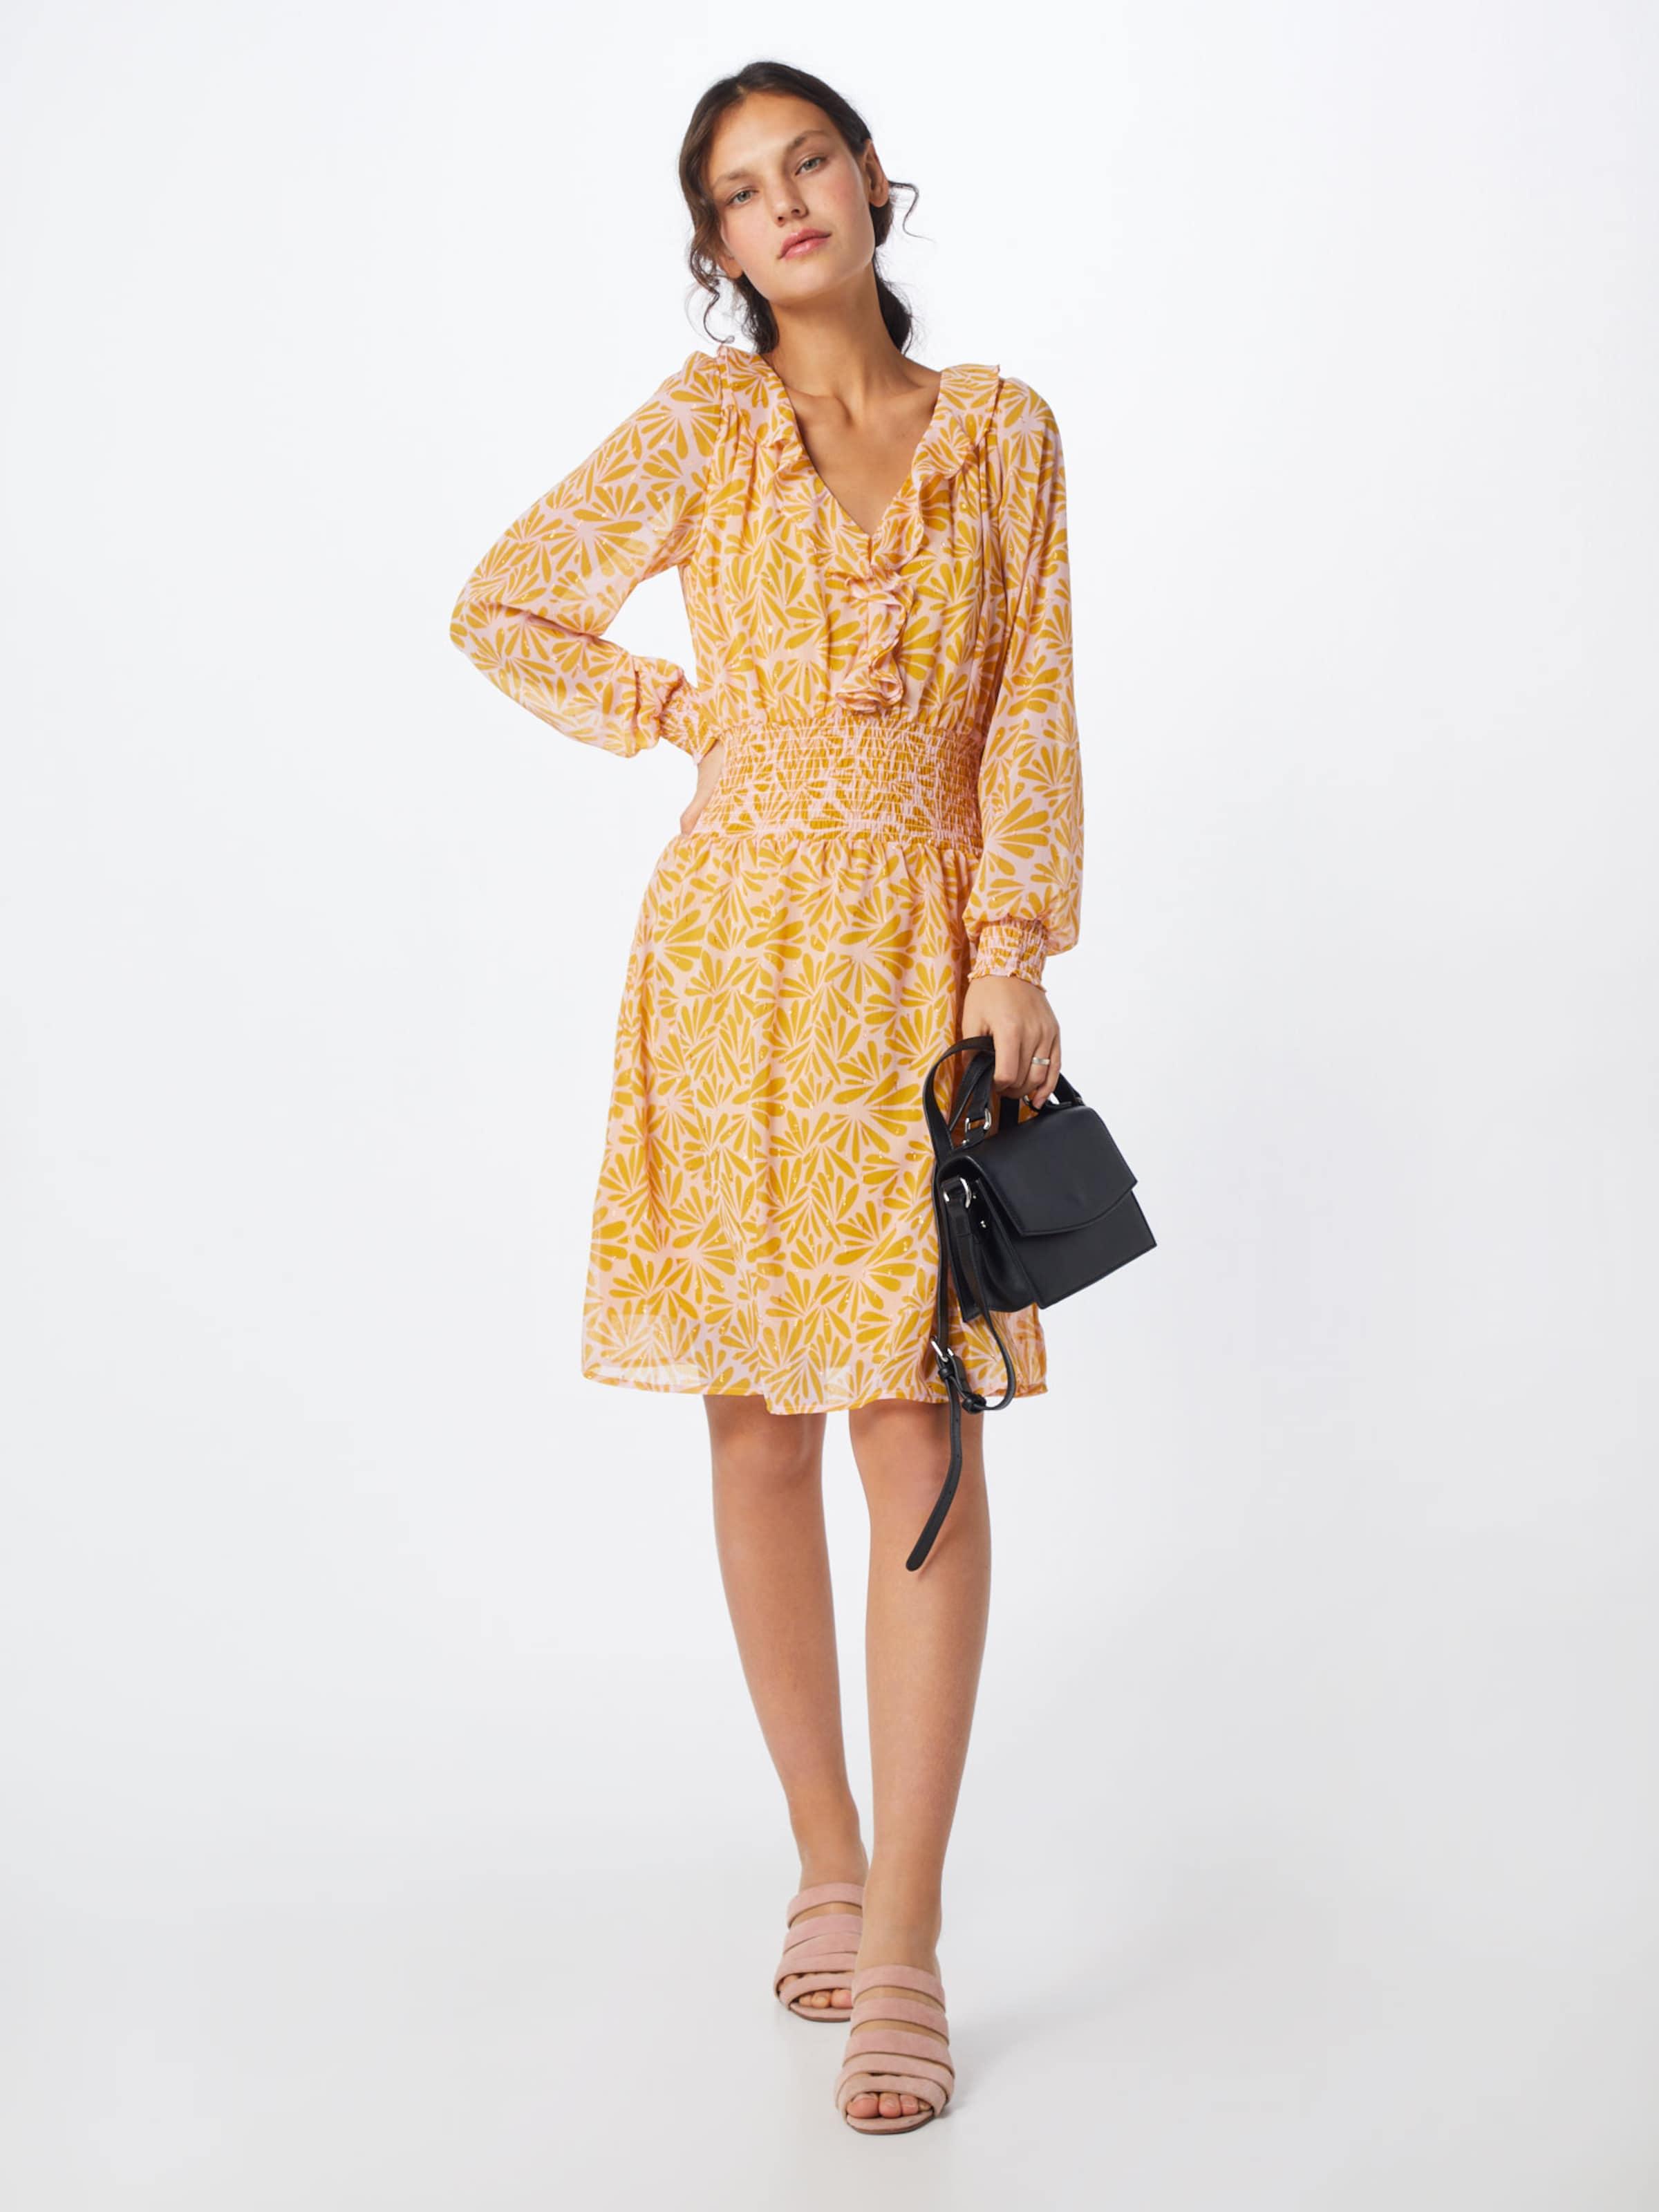 En Luxury Robe In 'crystal Soaked Dress' BeigeJaune PXZiku